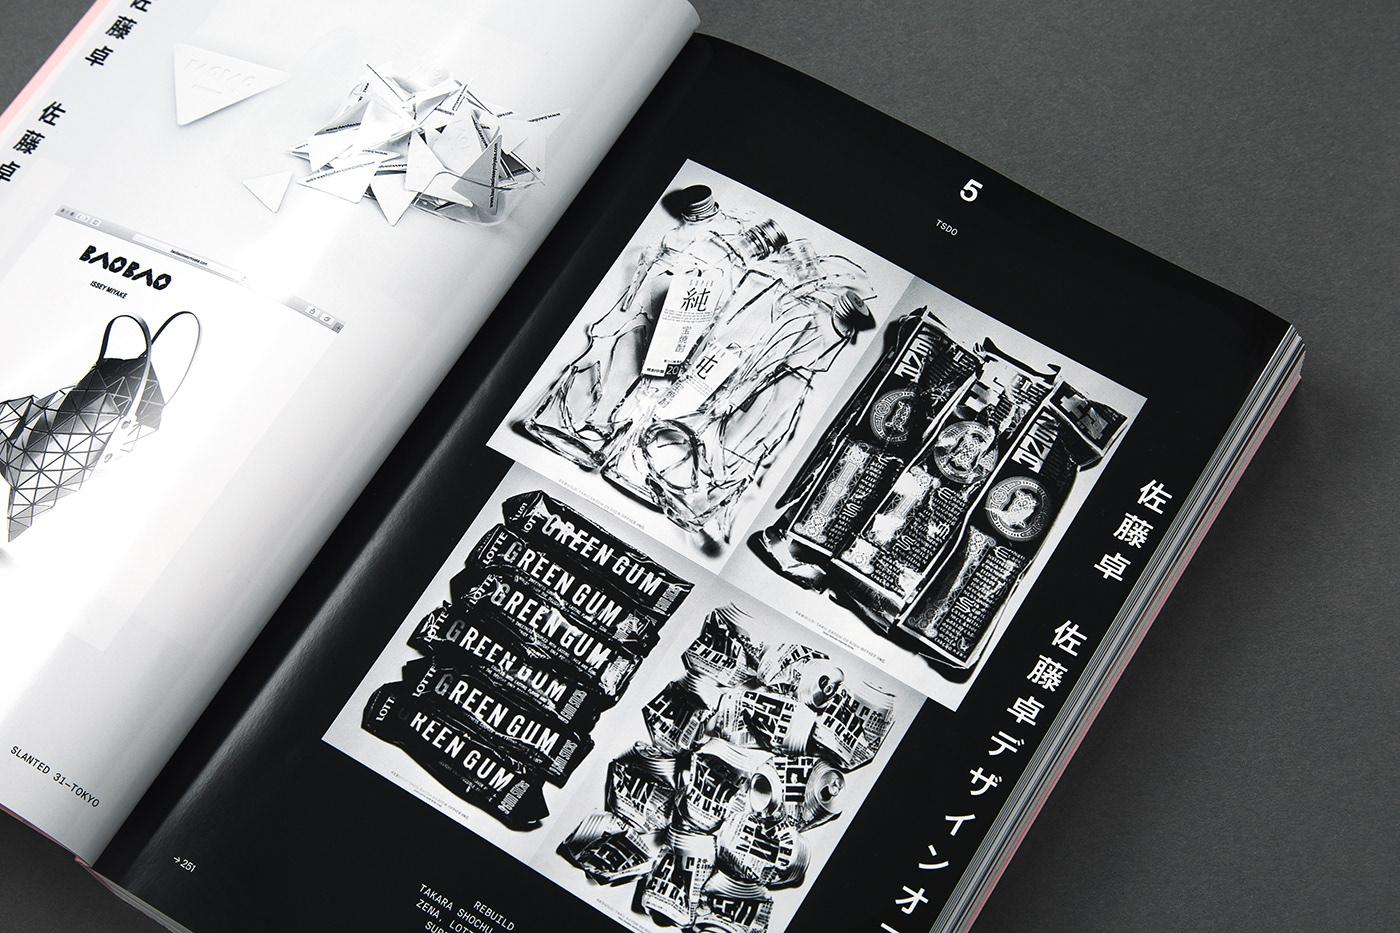 Slanted Magazine #31—Tokyo on Behance